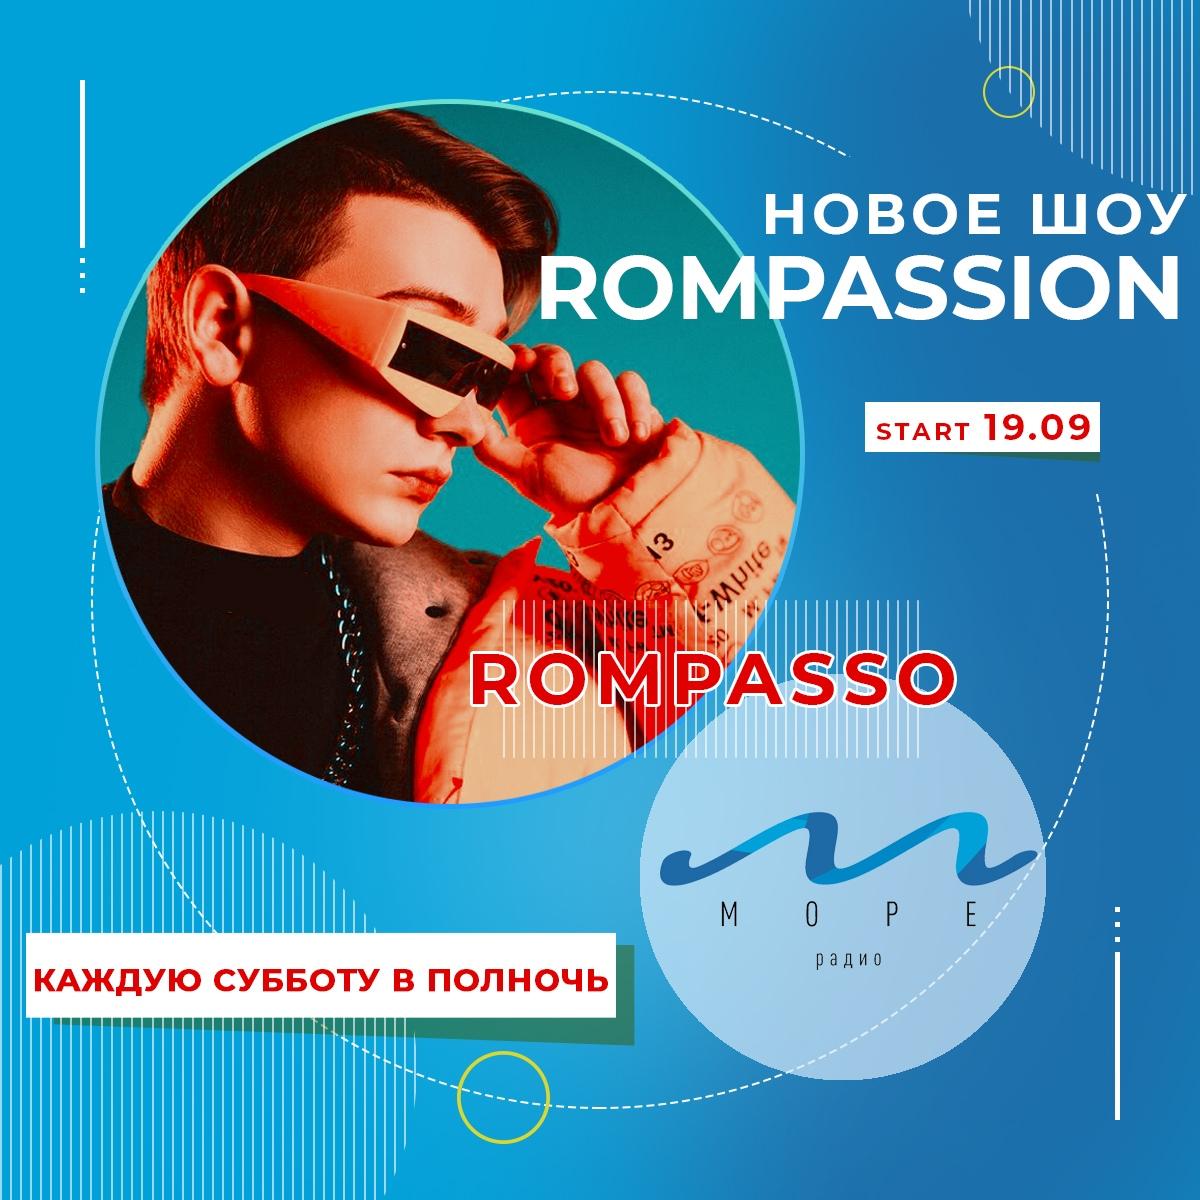 Новое шоу ROMPASSION!